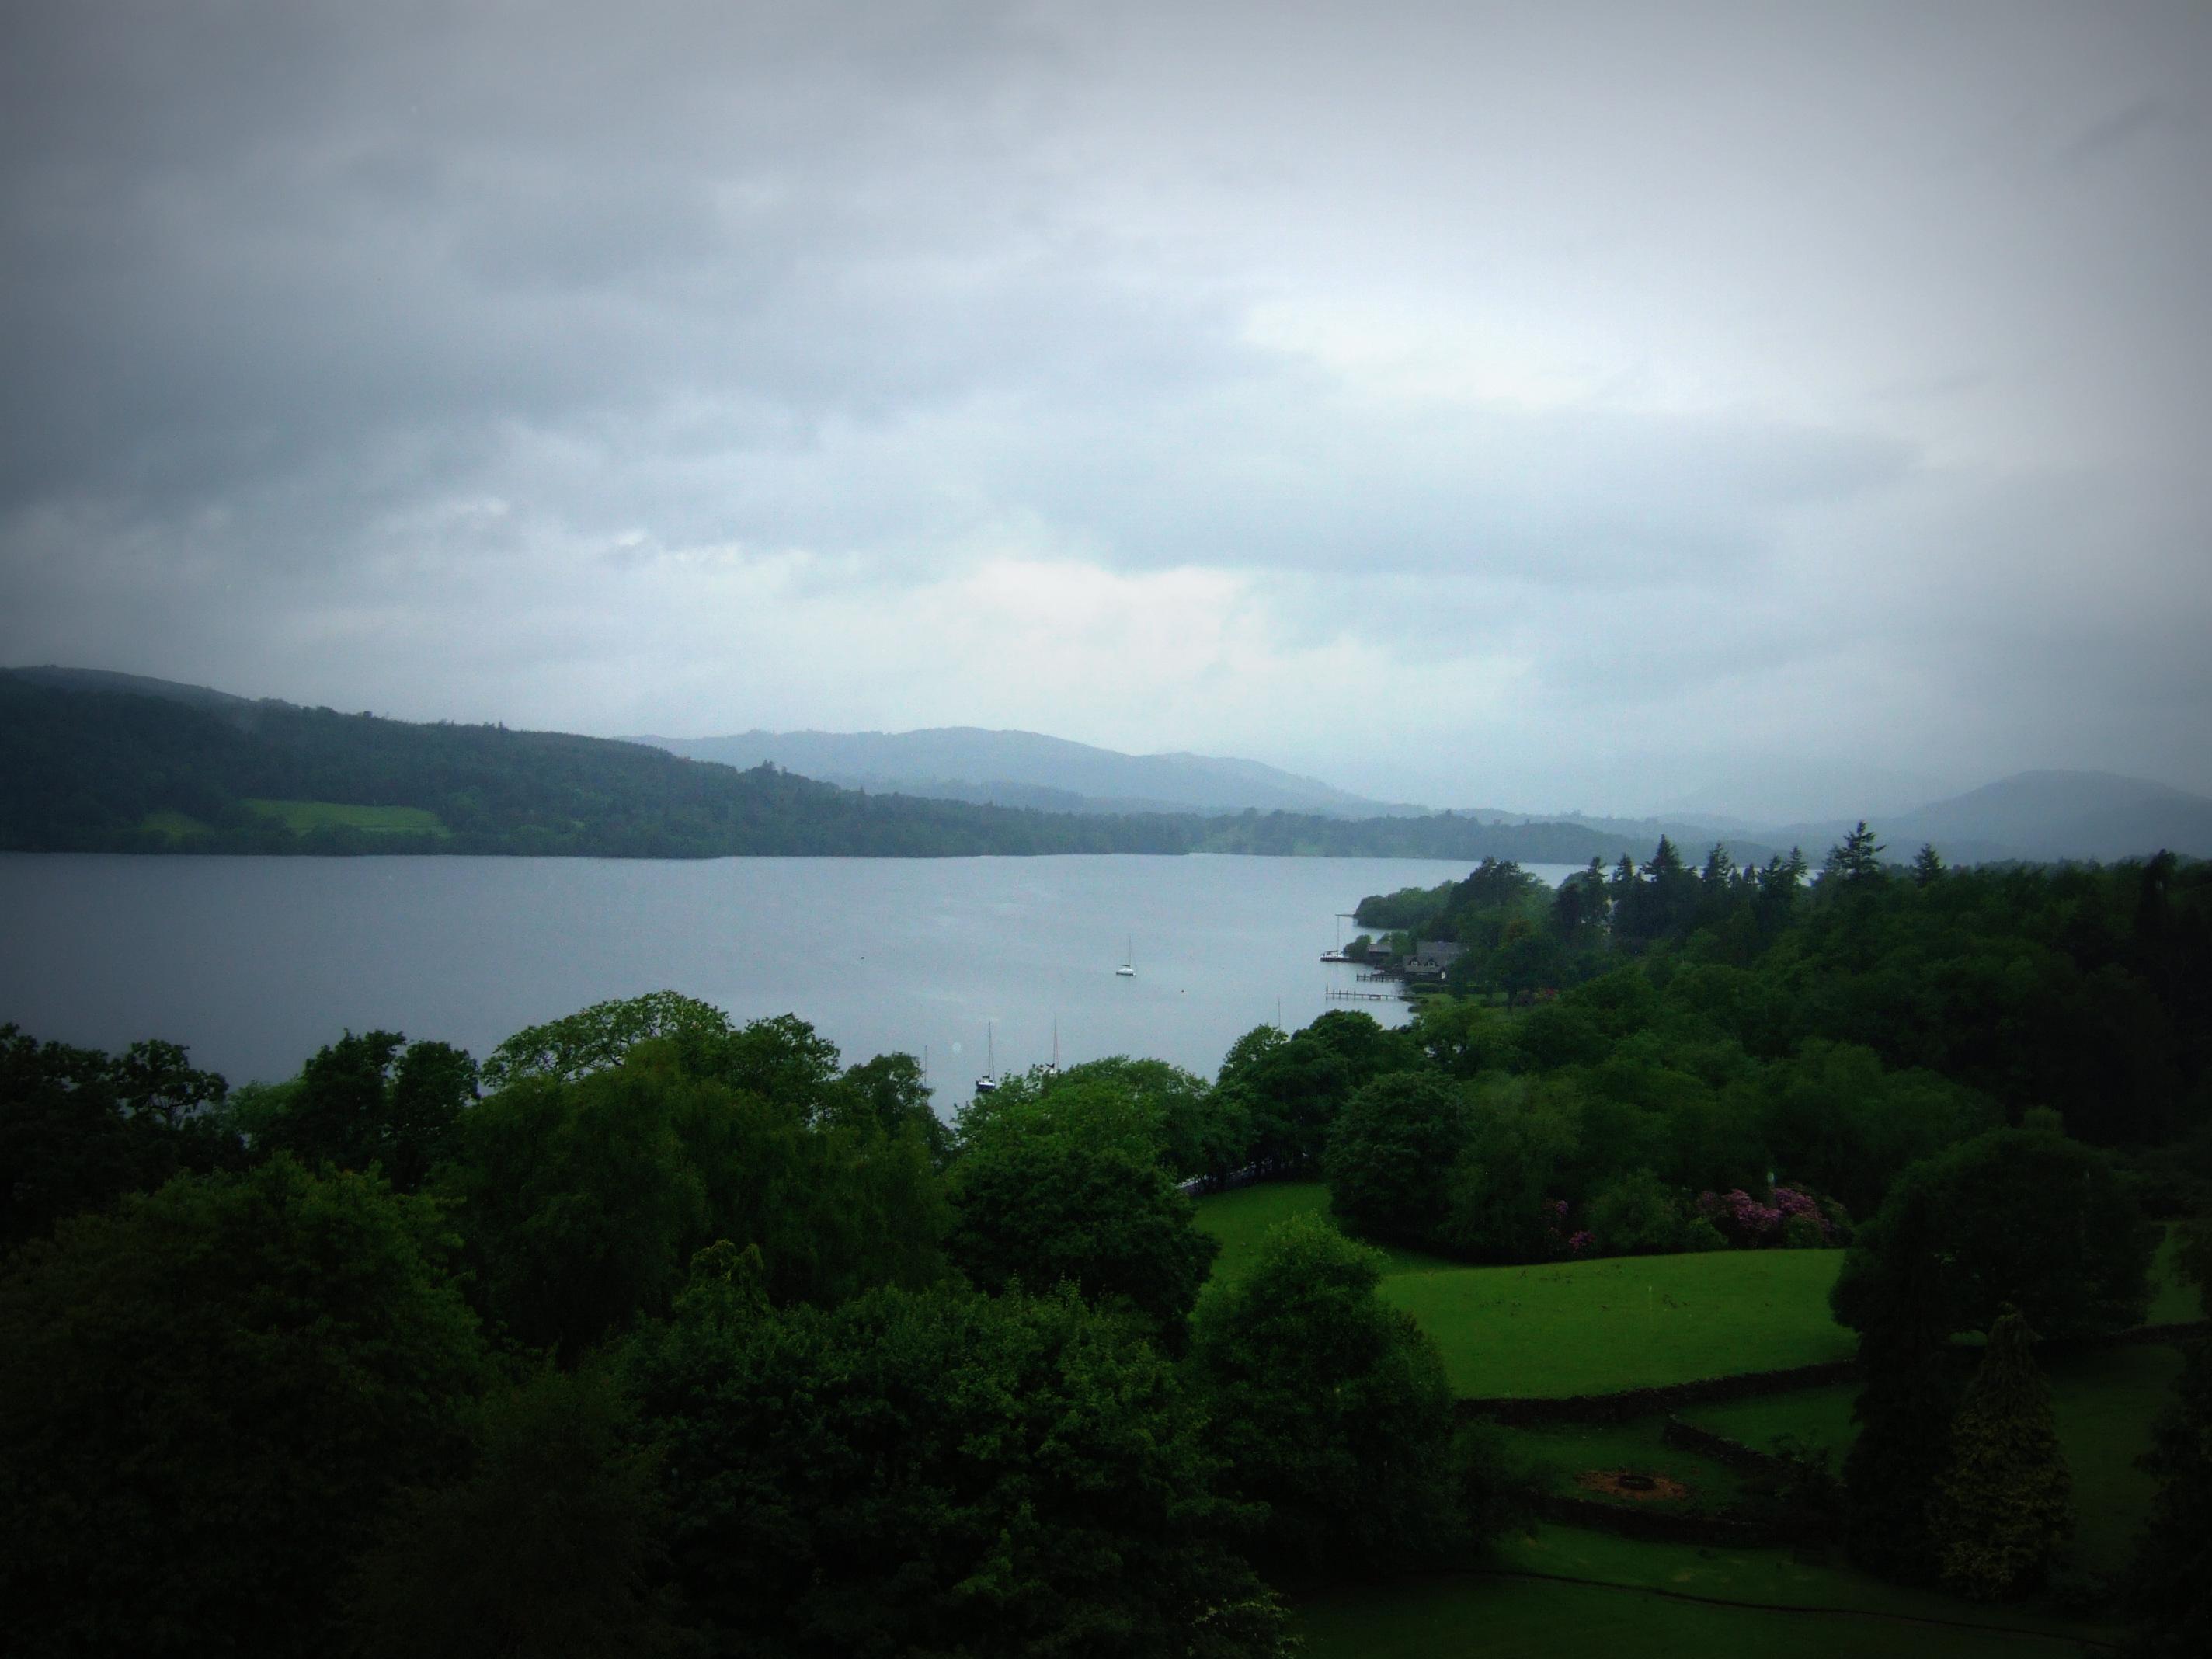 A dull weather call: Rain clouds over Windermere in the Lake District, Cumbria